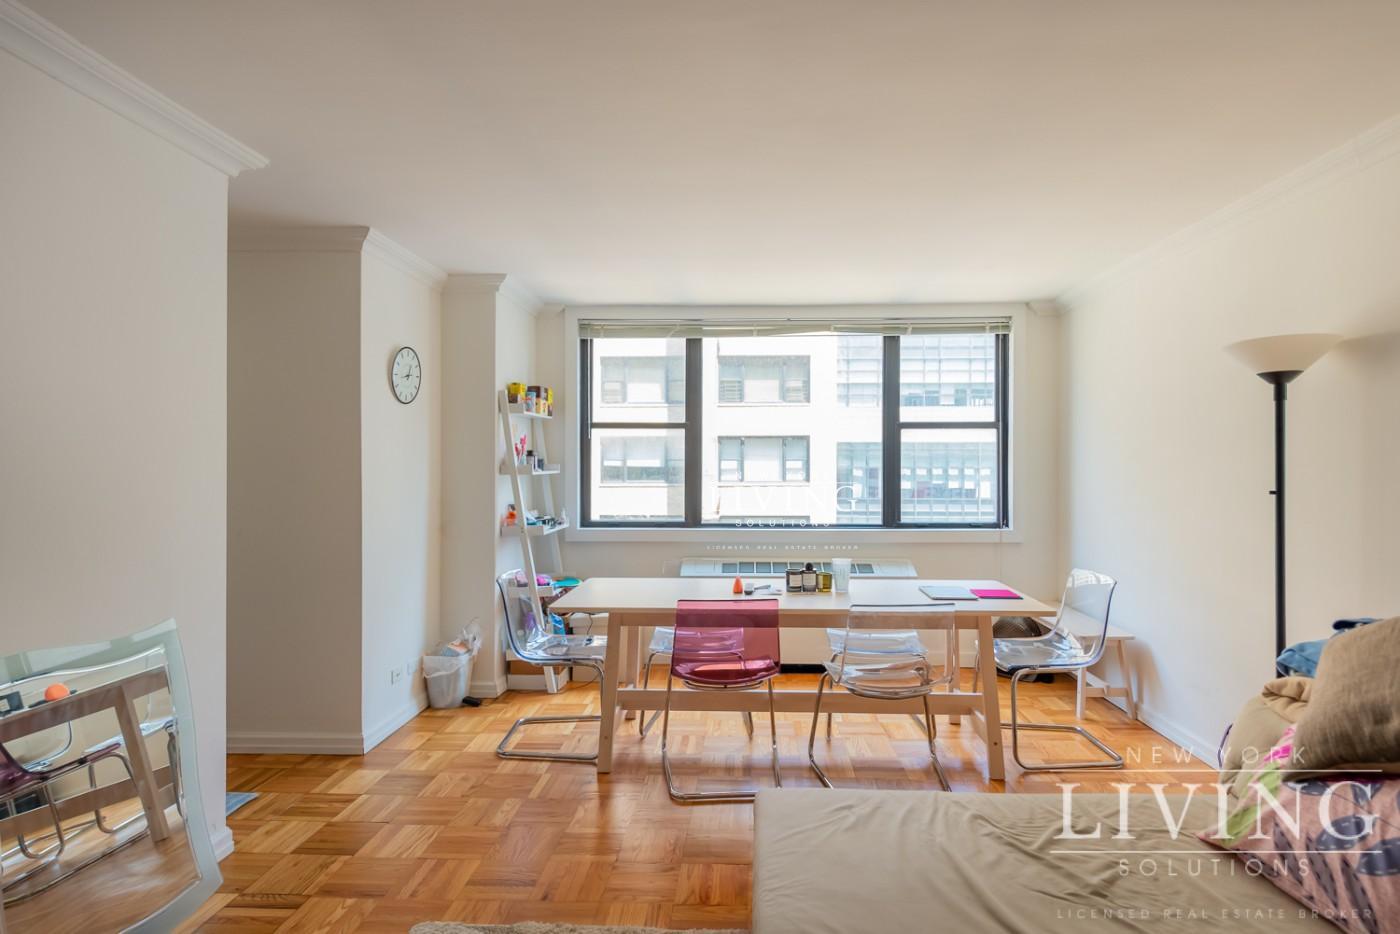 315 West 57th Street, Apt 11K, Manhattan, New York 10019